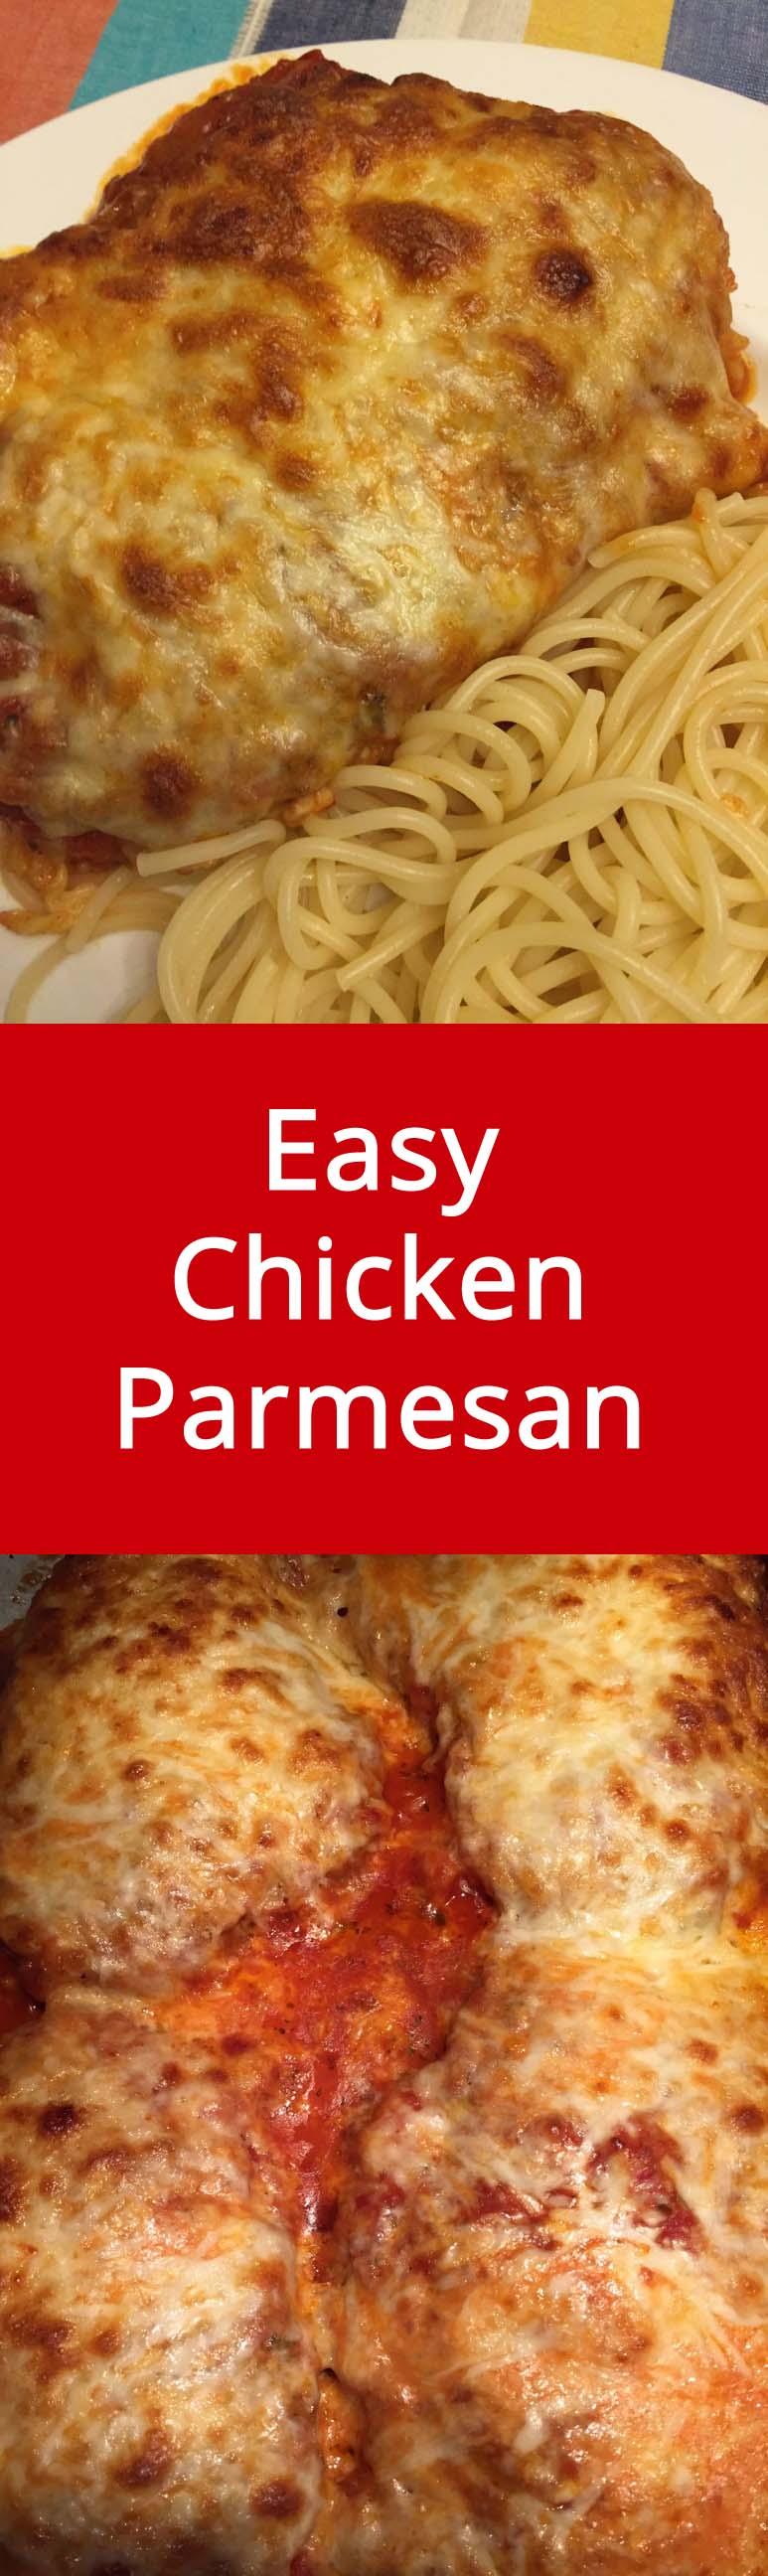 Easy Italian Chicken Parmesan Recipe | MelanieCooks.com